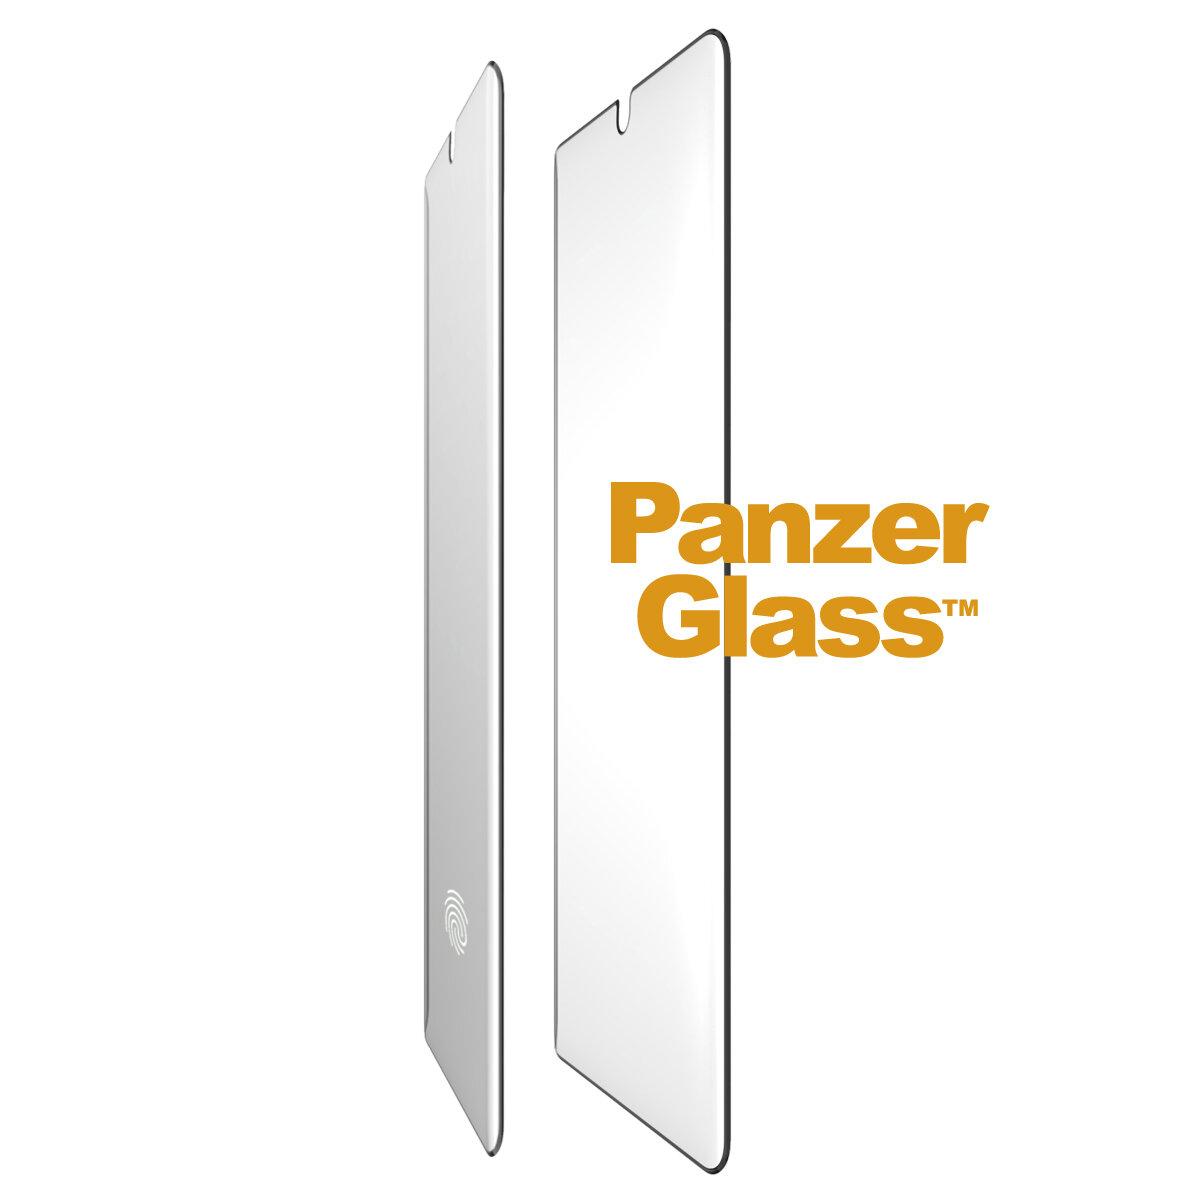 PanzerGlass Case Friendly Biometric for Galaxy S20+ black